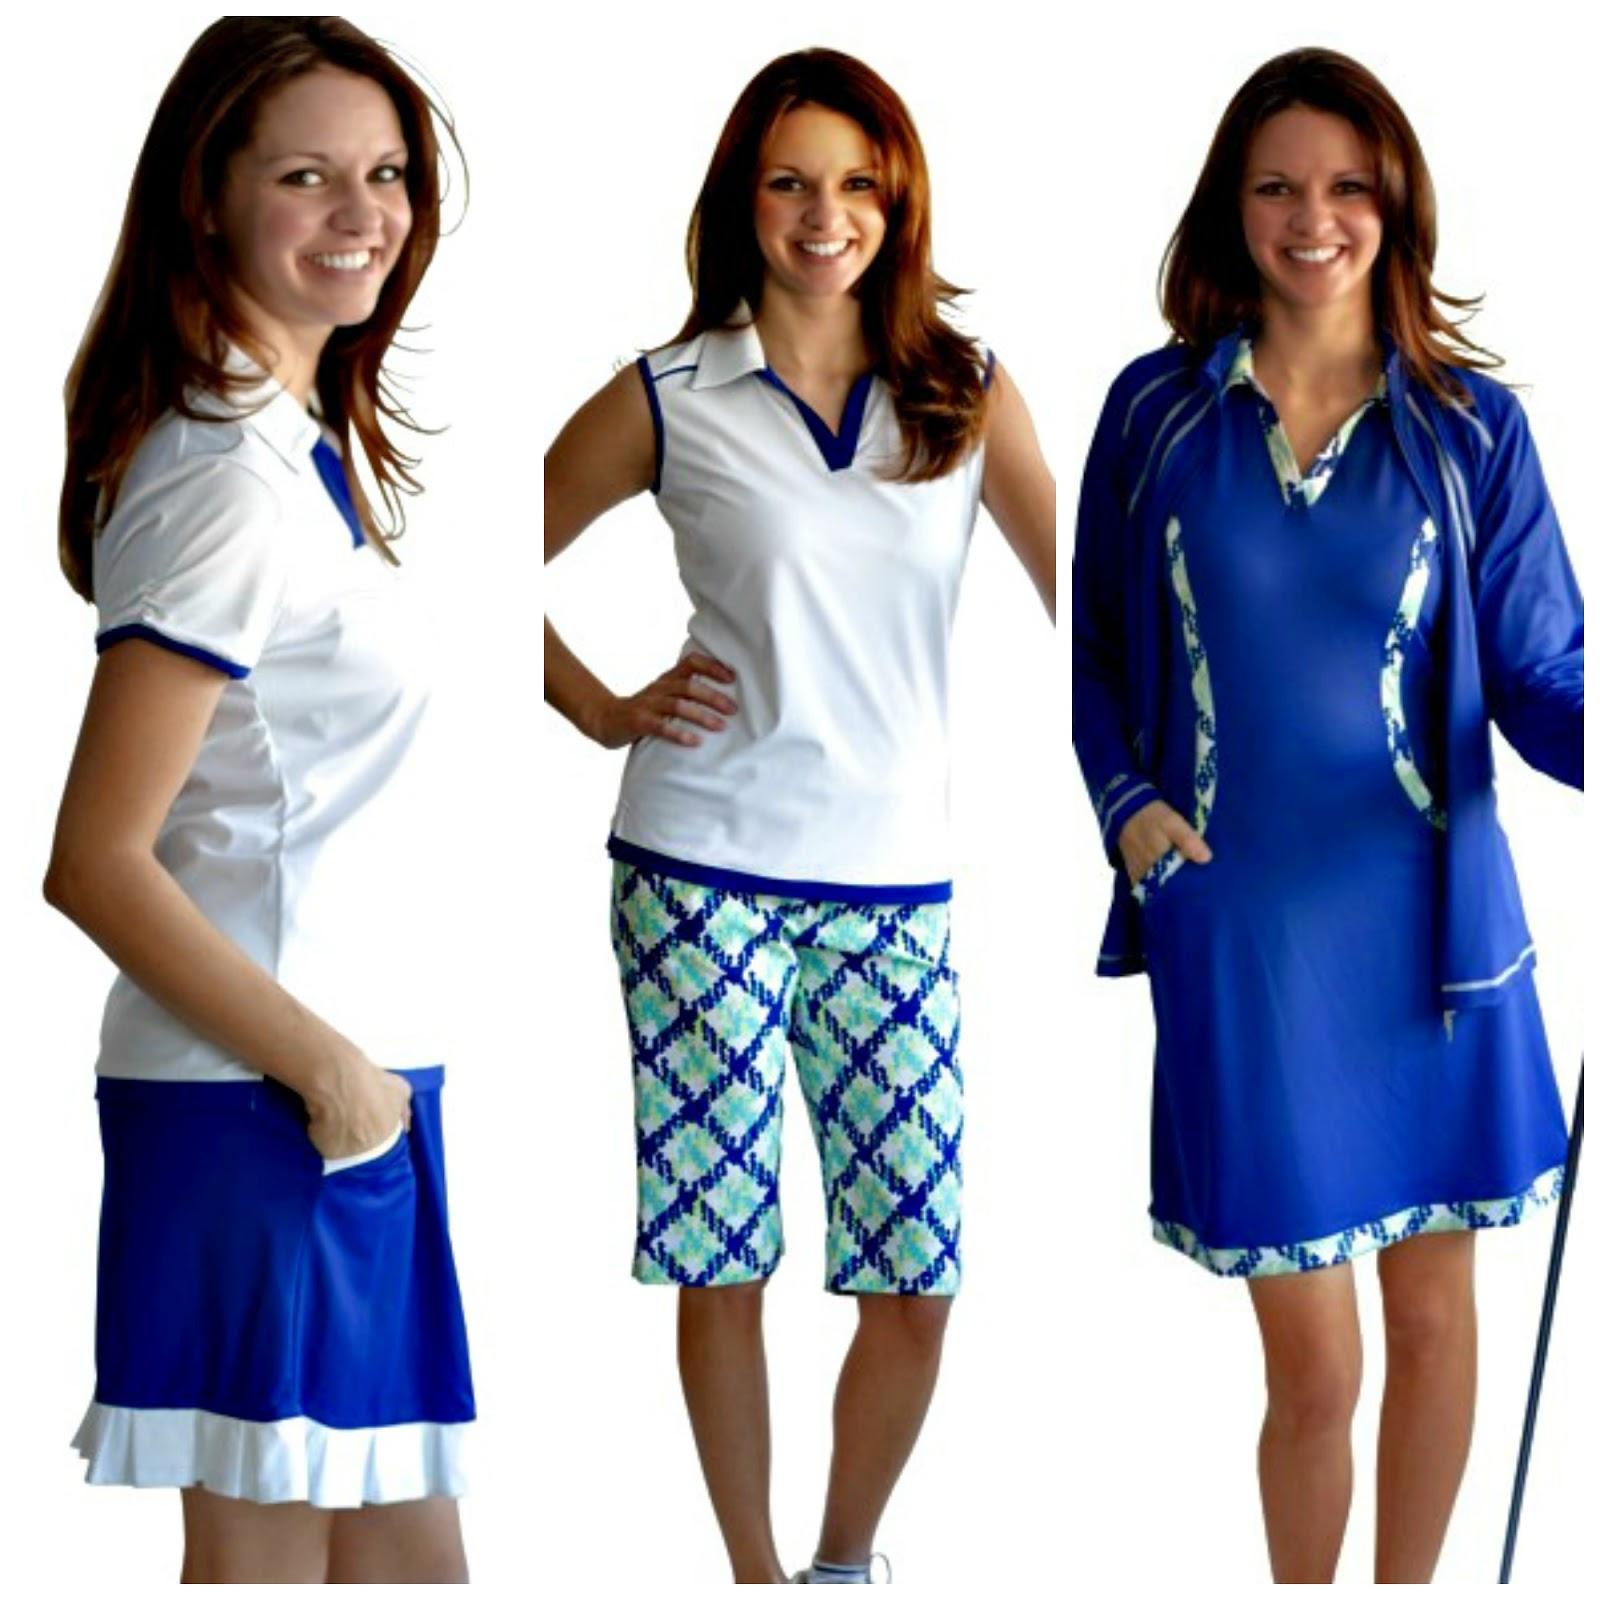 http://www.pinkgolftees.com/golfher.html